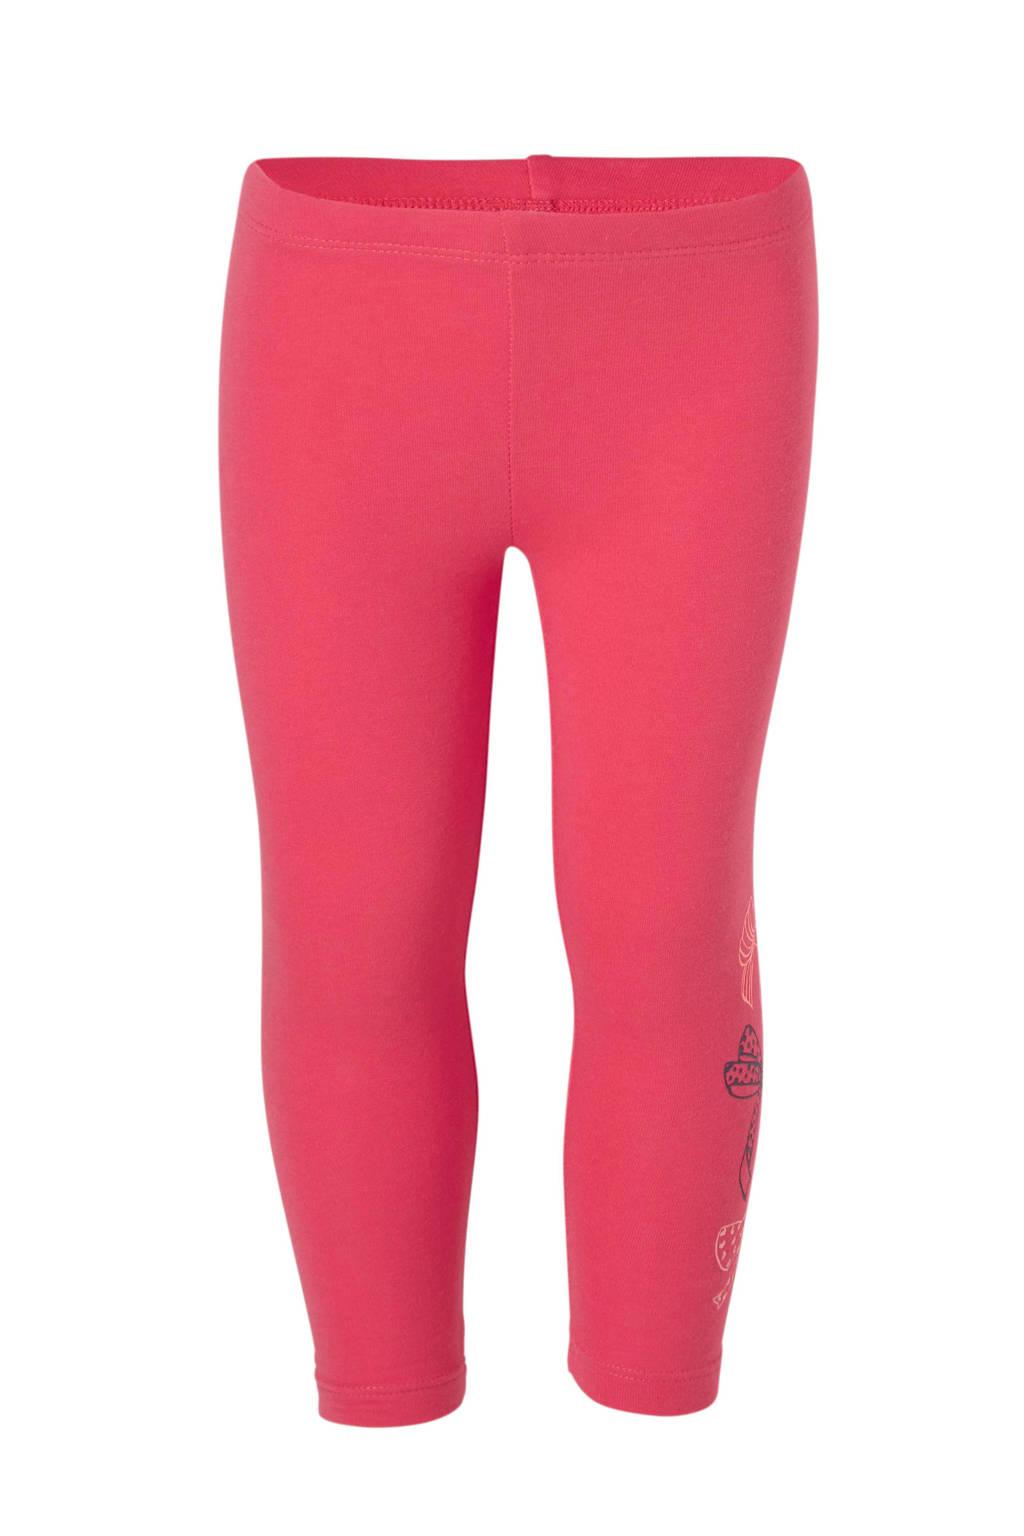 C&A Palomino legging roze, Roze